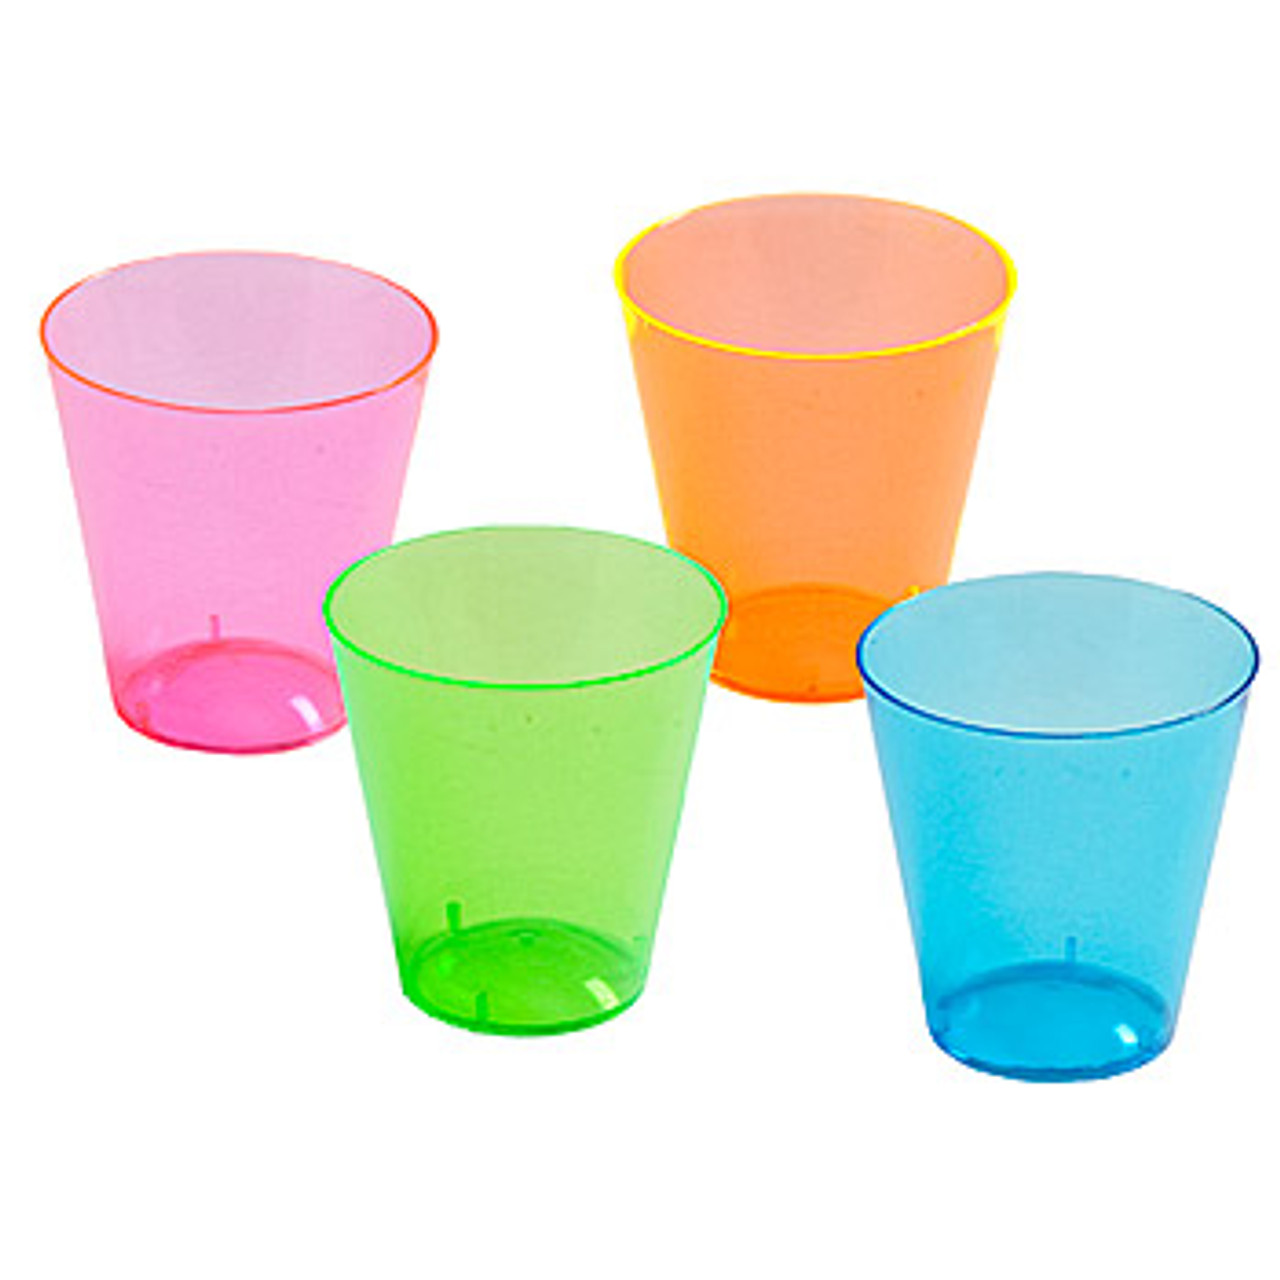 NEON SHOT GLASSES 1 OZ, PARTIES, NEON, GLOW, UV REACTIVE, SHOT GLASS, 2 OZ